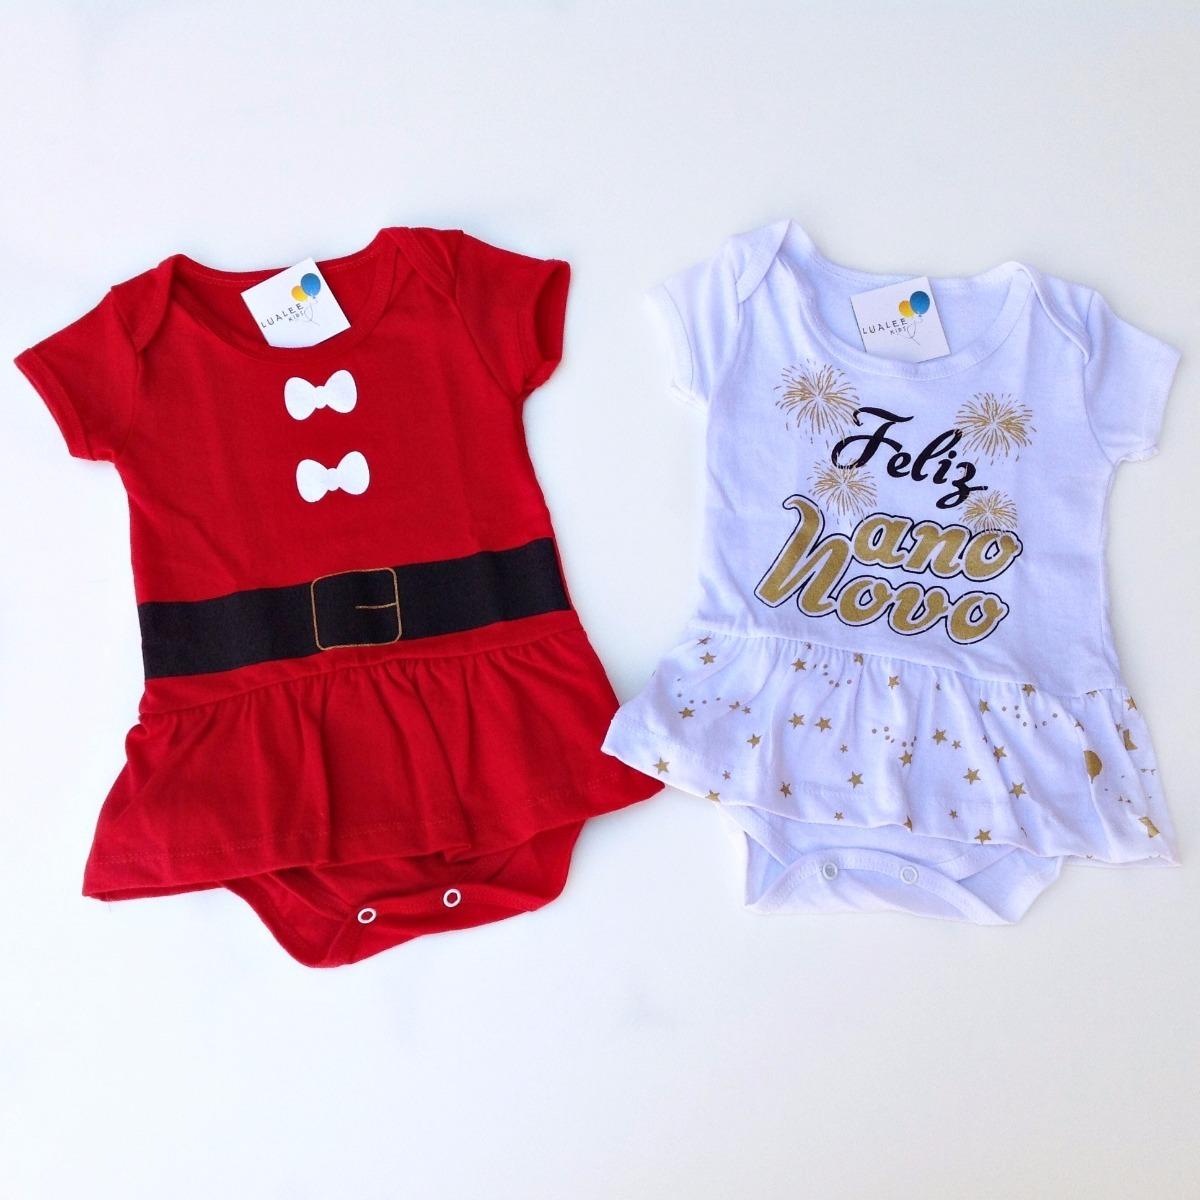 5e573ae237 Kit Body Infantil Bebê Menina Natal E Ano Novo Frete Grátis - R  94 ...